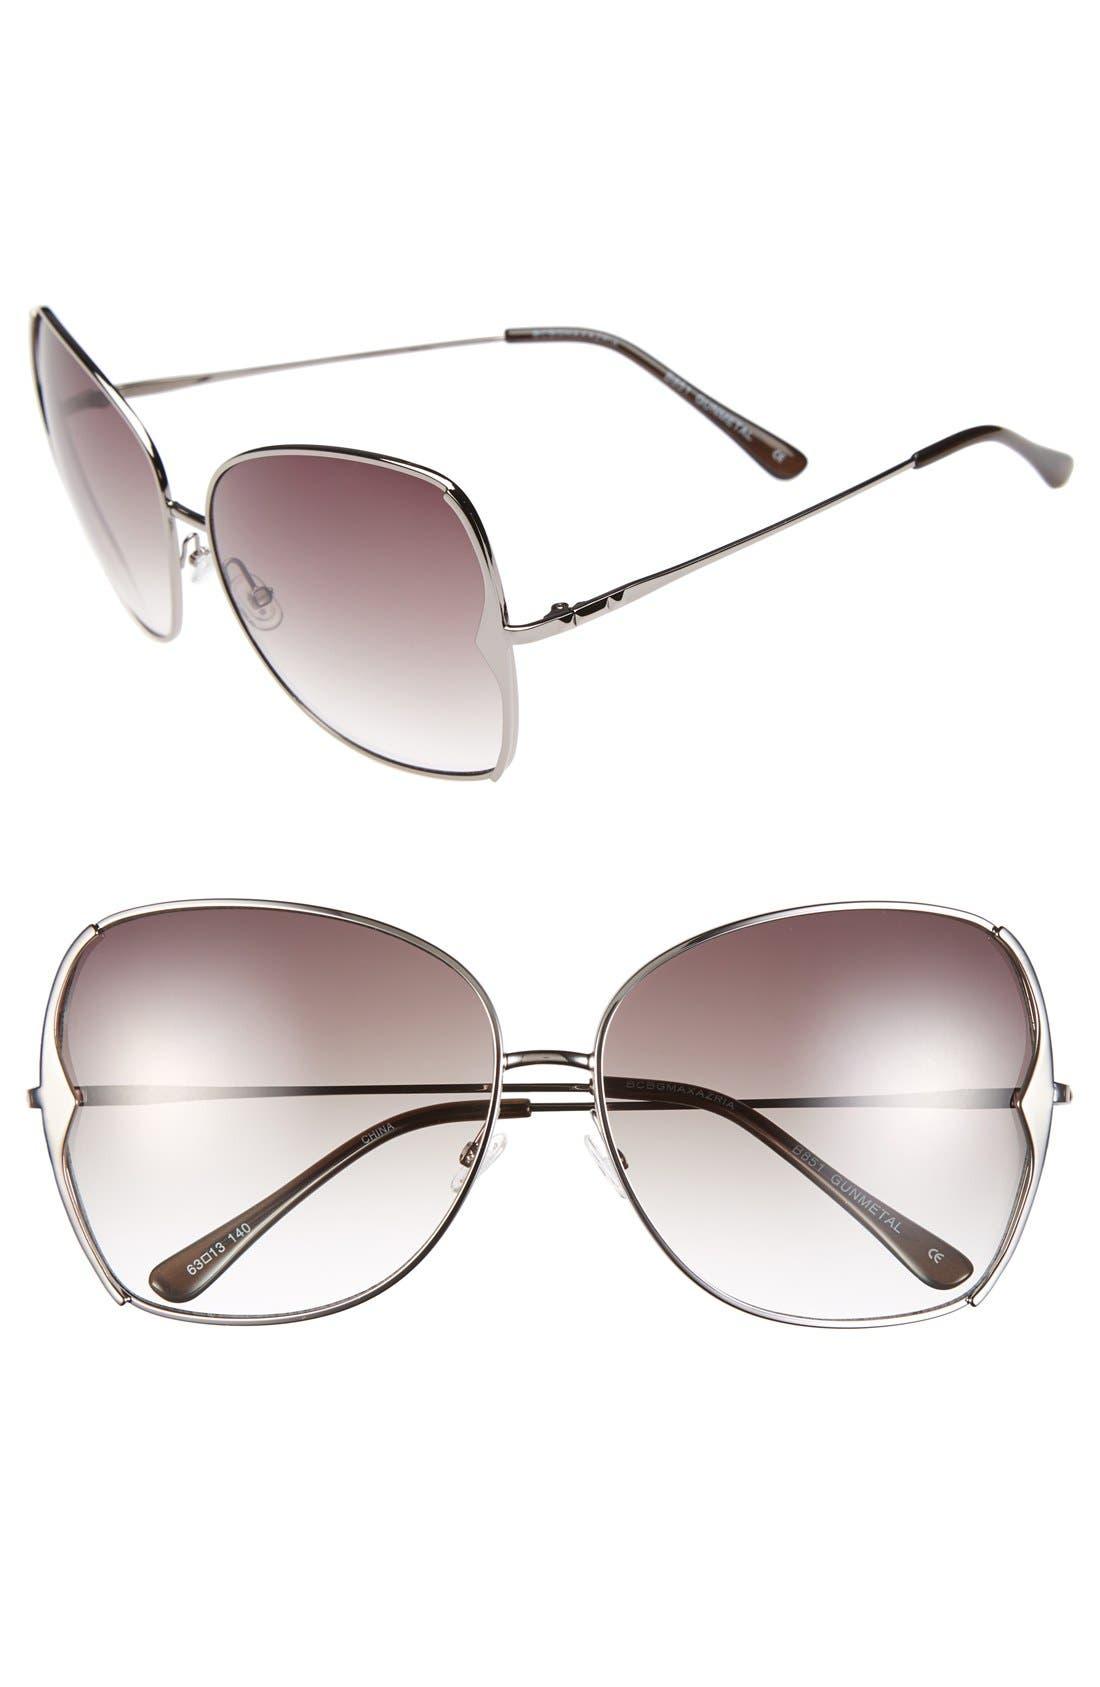 BCBGMAXAZRIA 63mm Butterfly Sunglasses, Main, color, 020